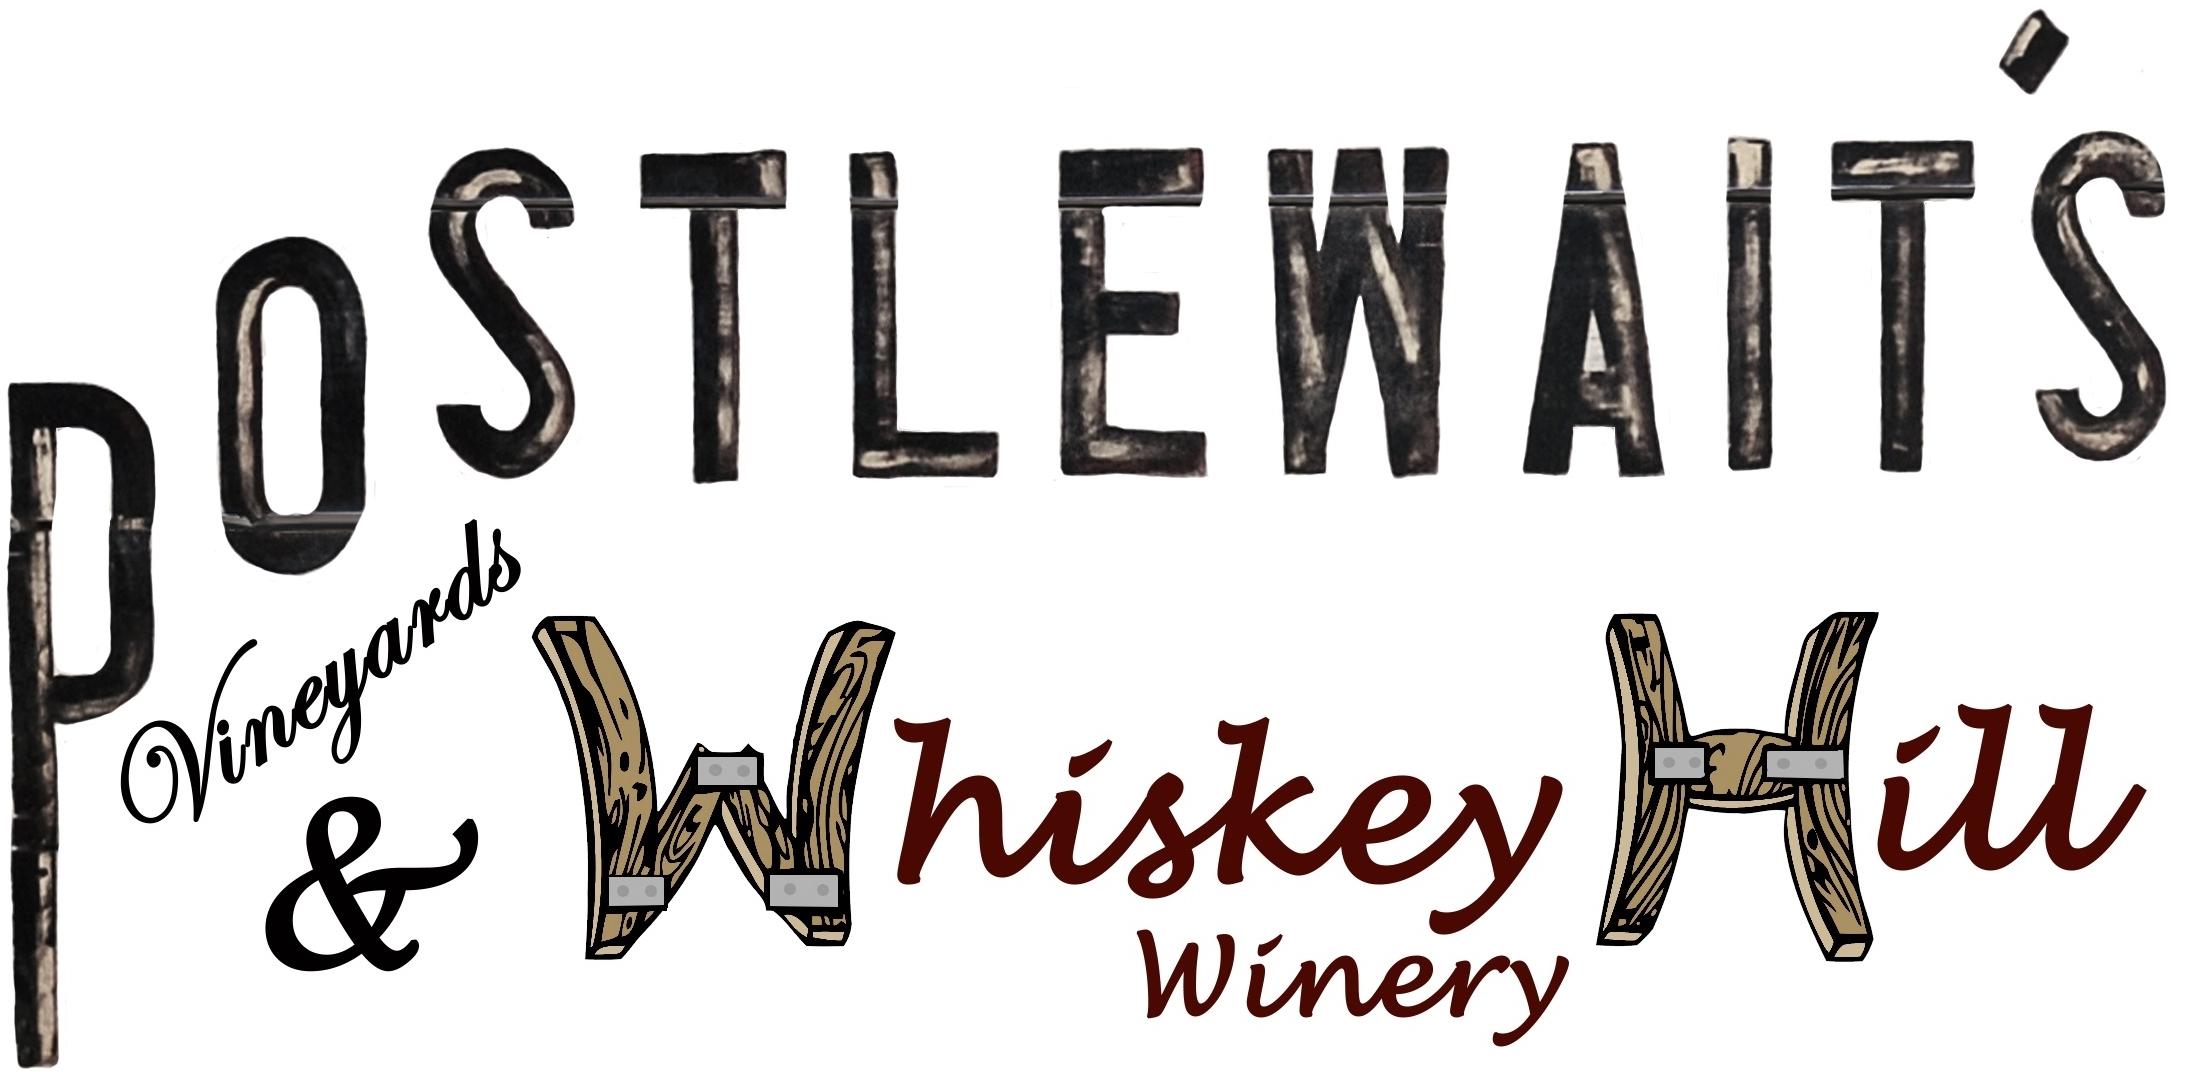 Whiskey Hill Winery Tall.jpg